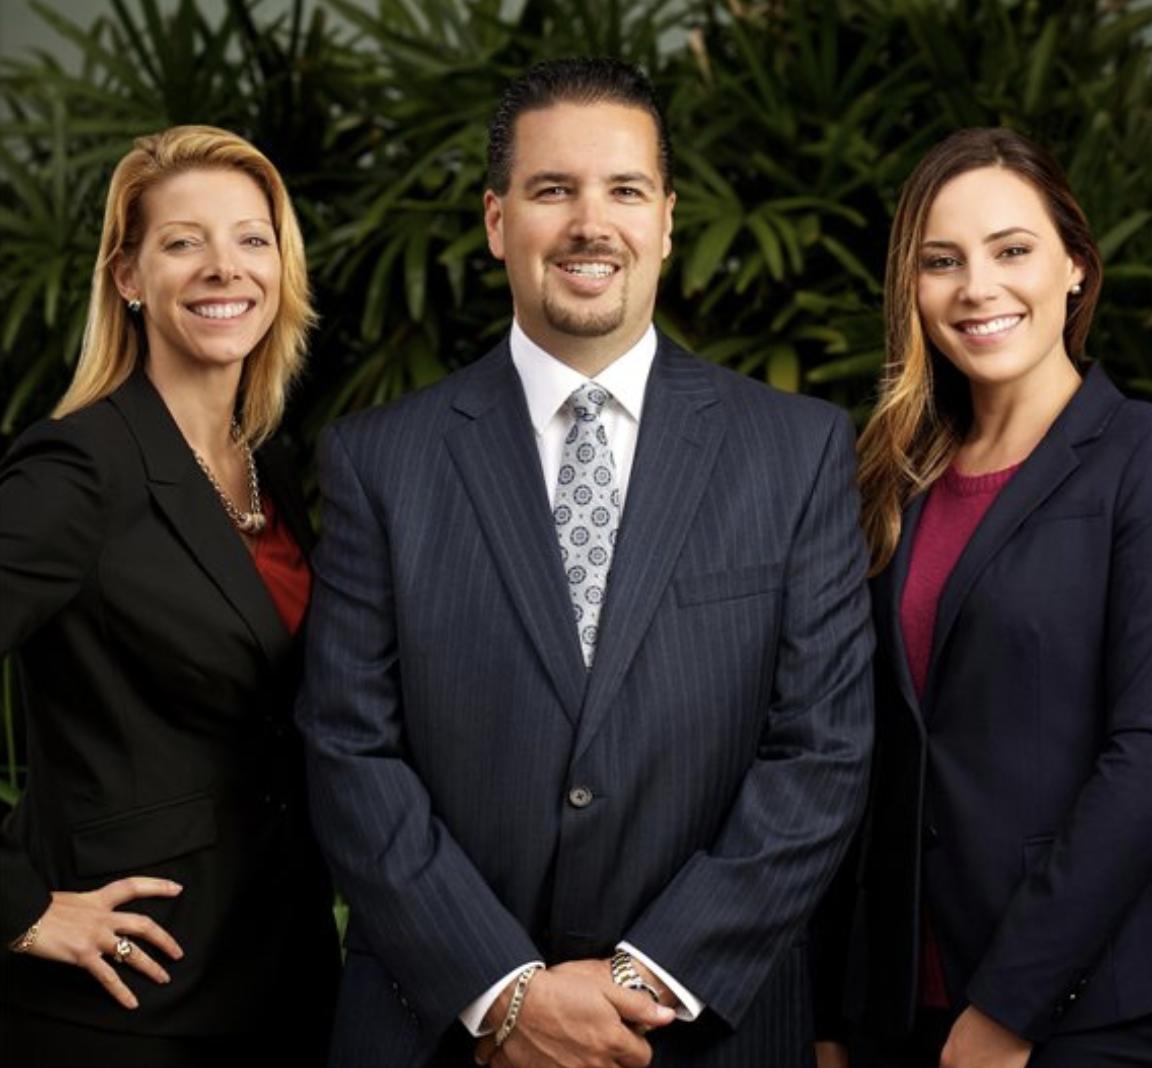 Jurewitz Law Group